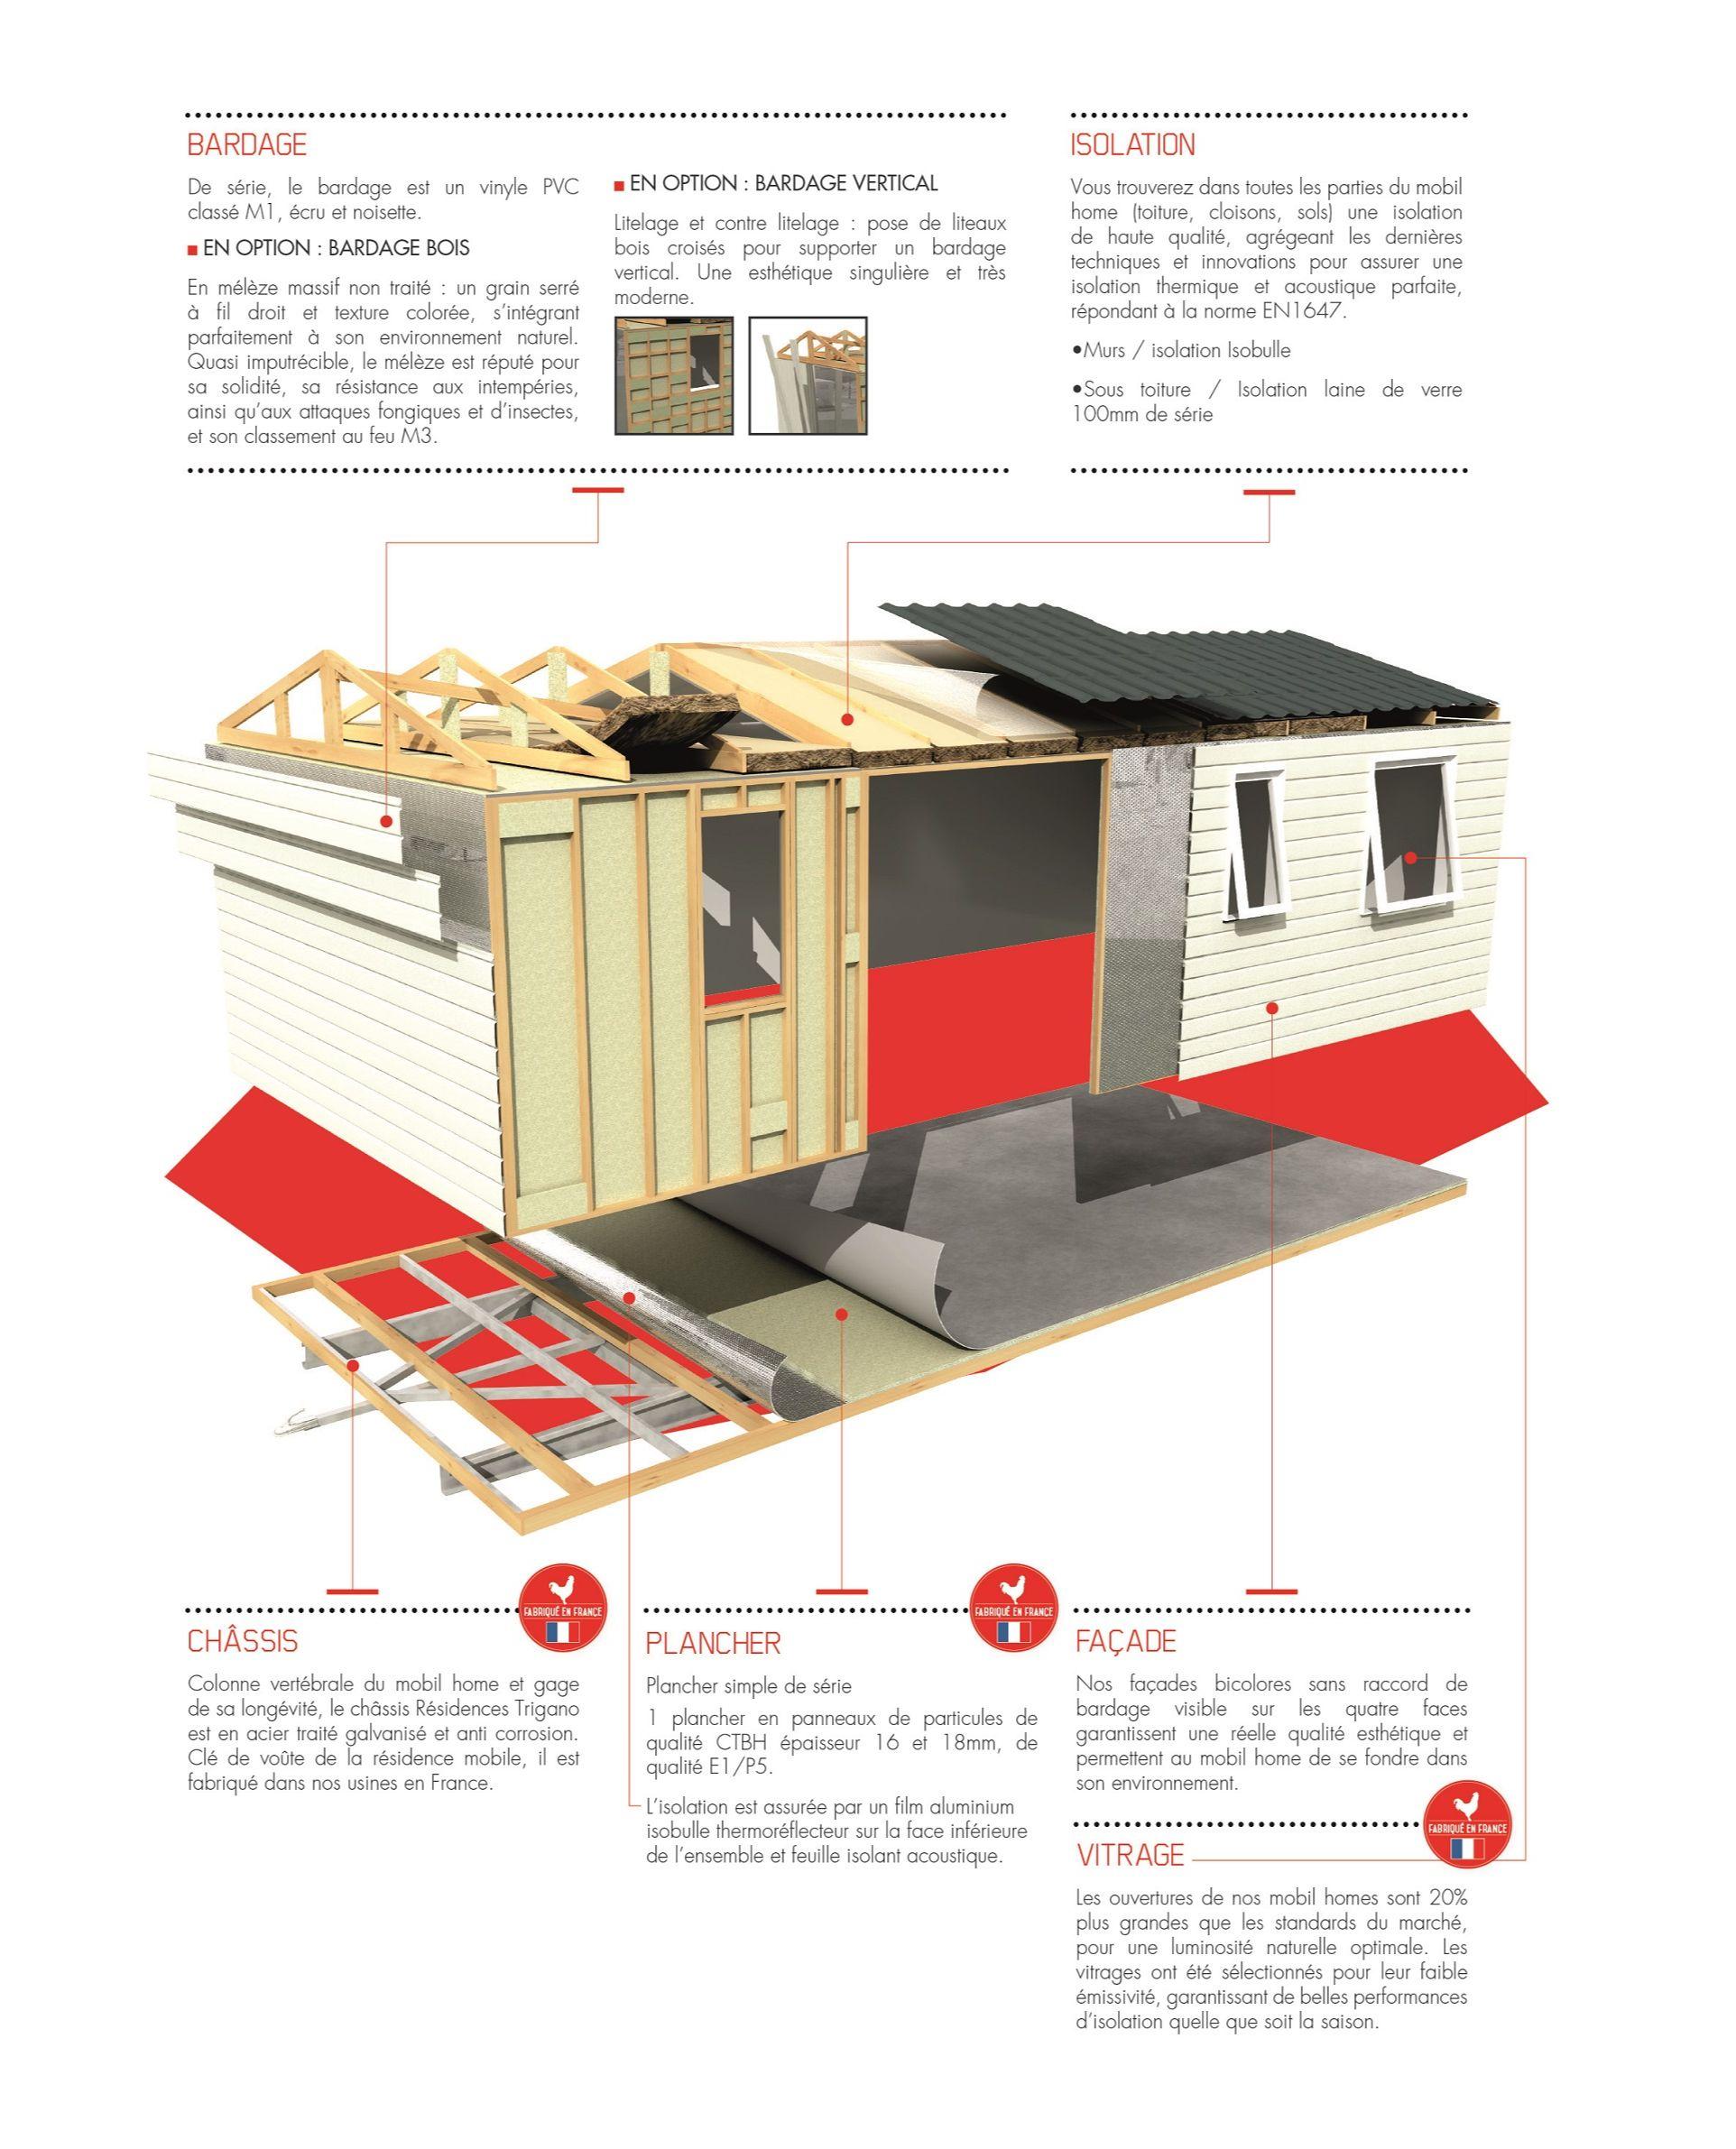 residence trigano-la-fabrication-vue-3d